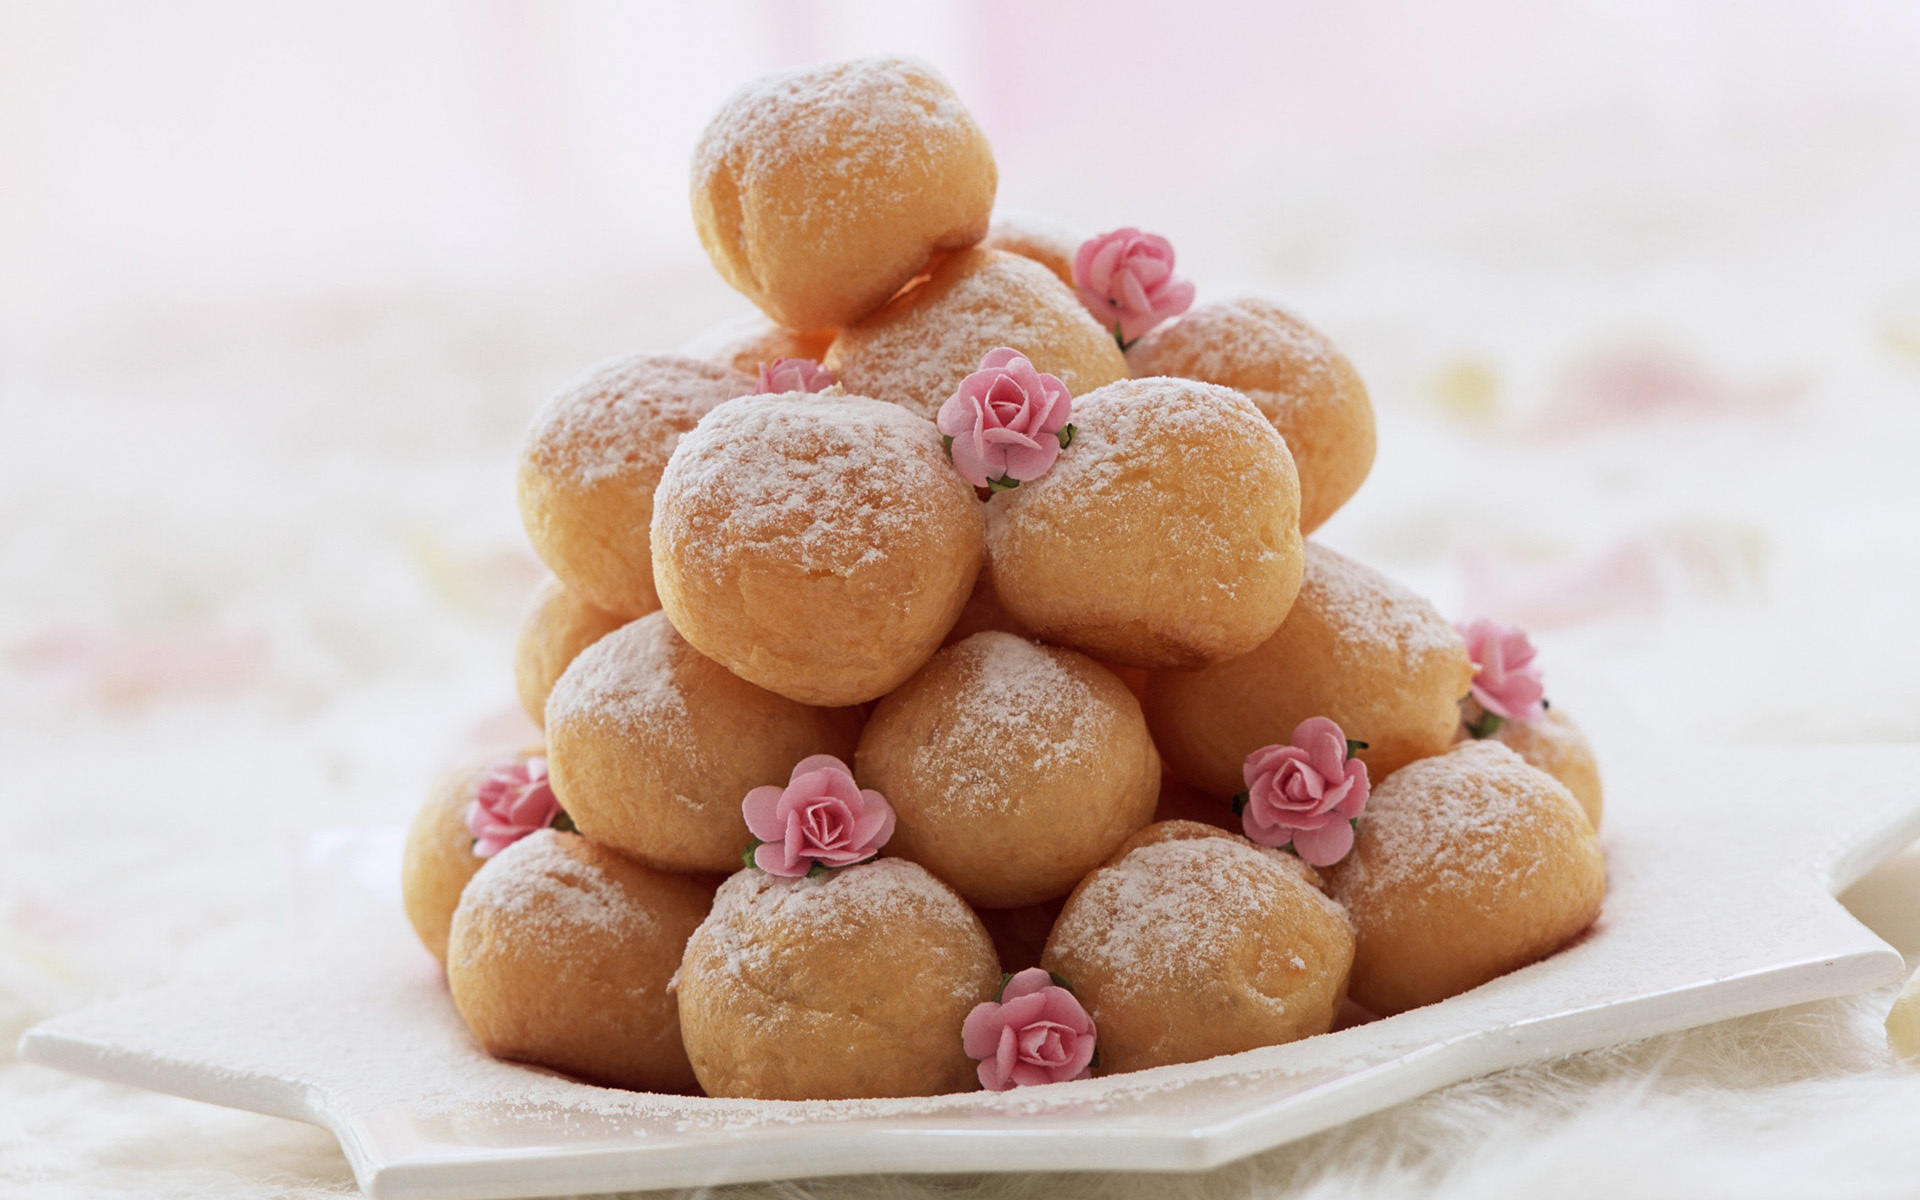 Basik ru обои на рабочий стол сладости